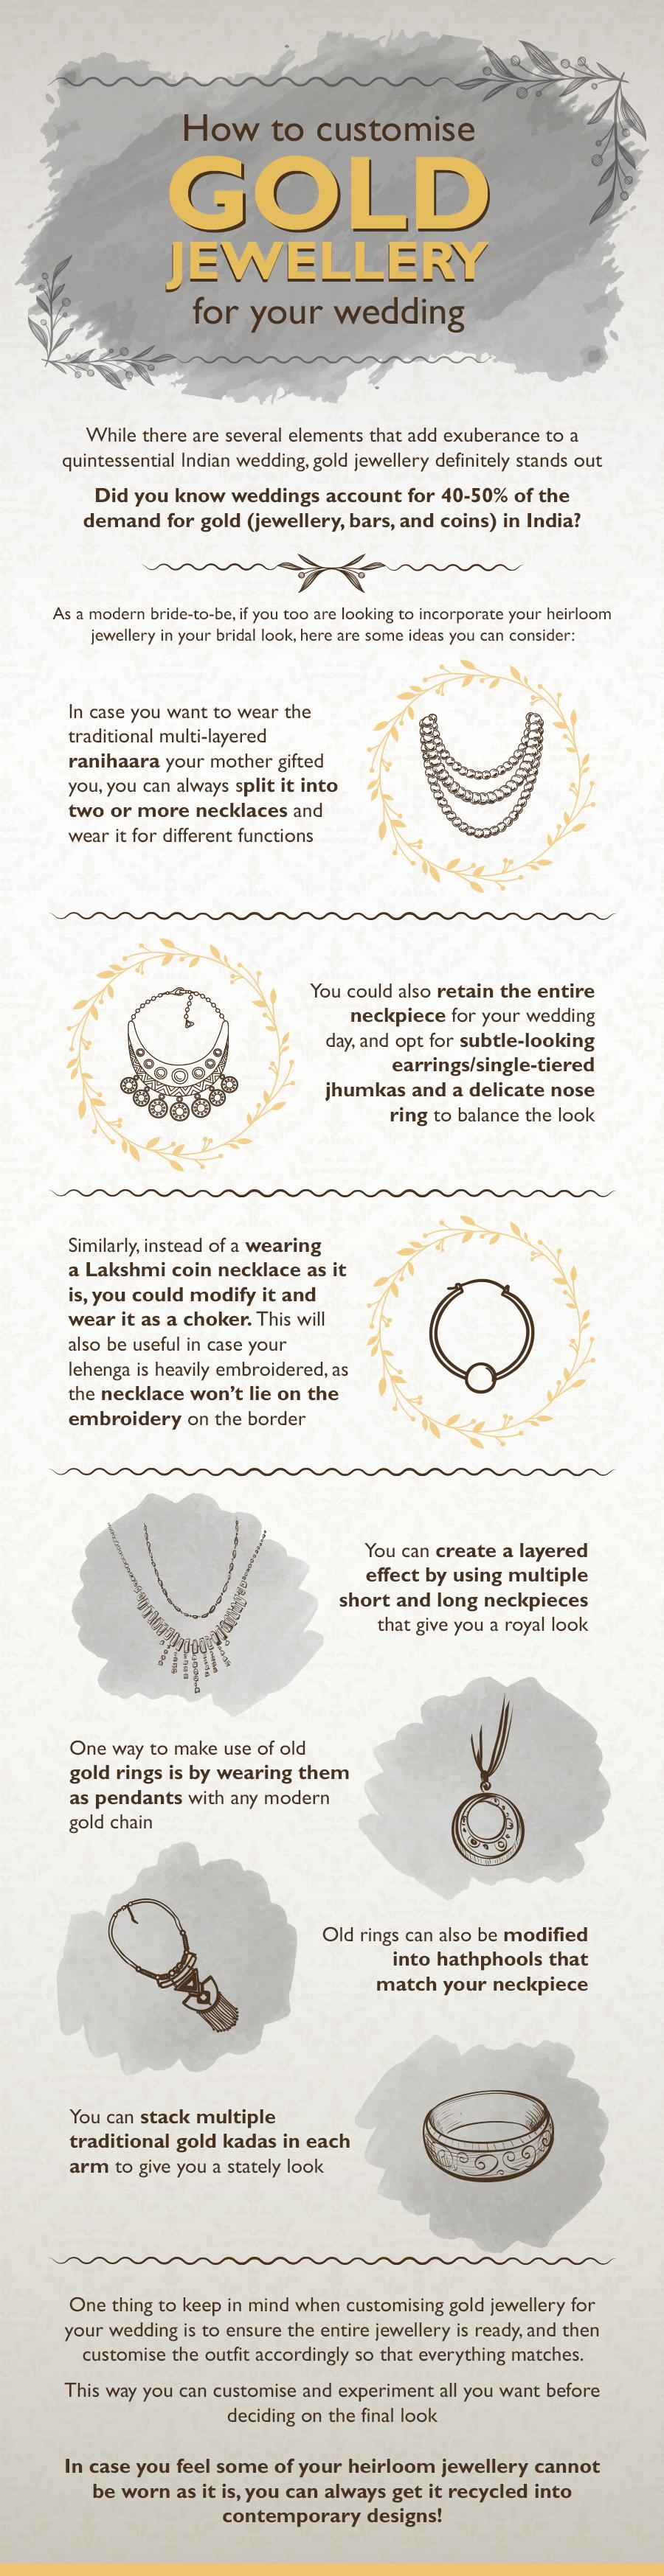 Wedding Gold Jewellery Customization